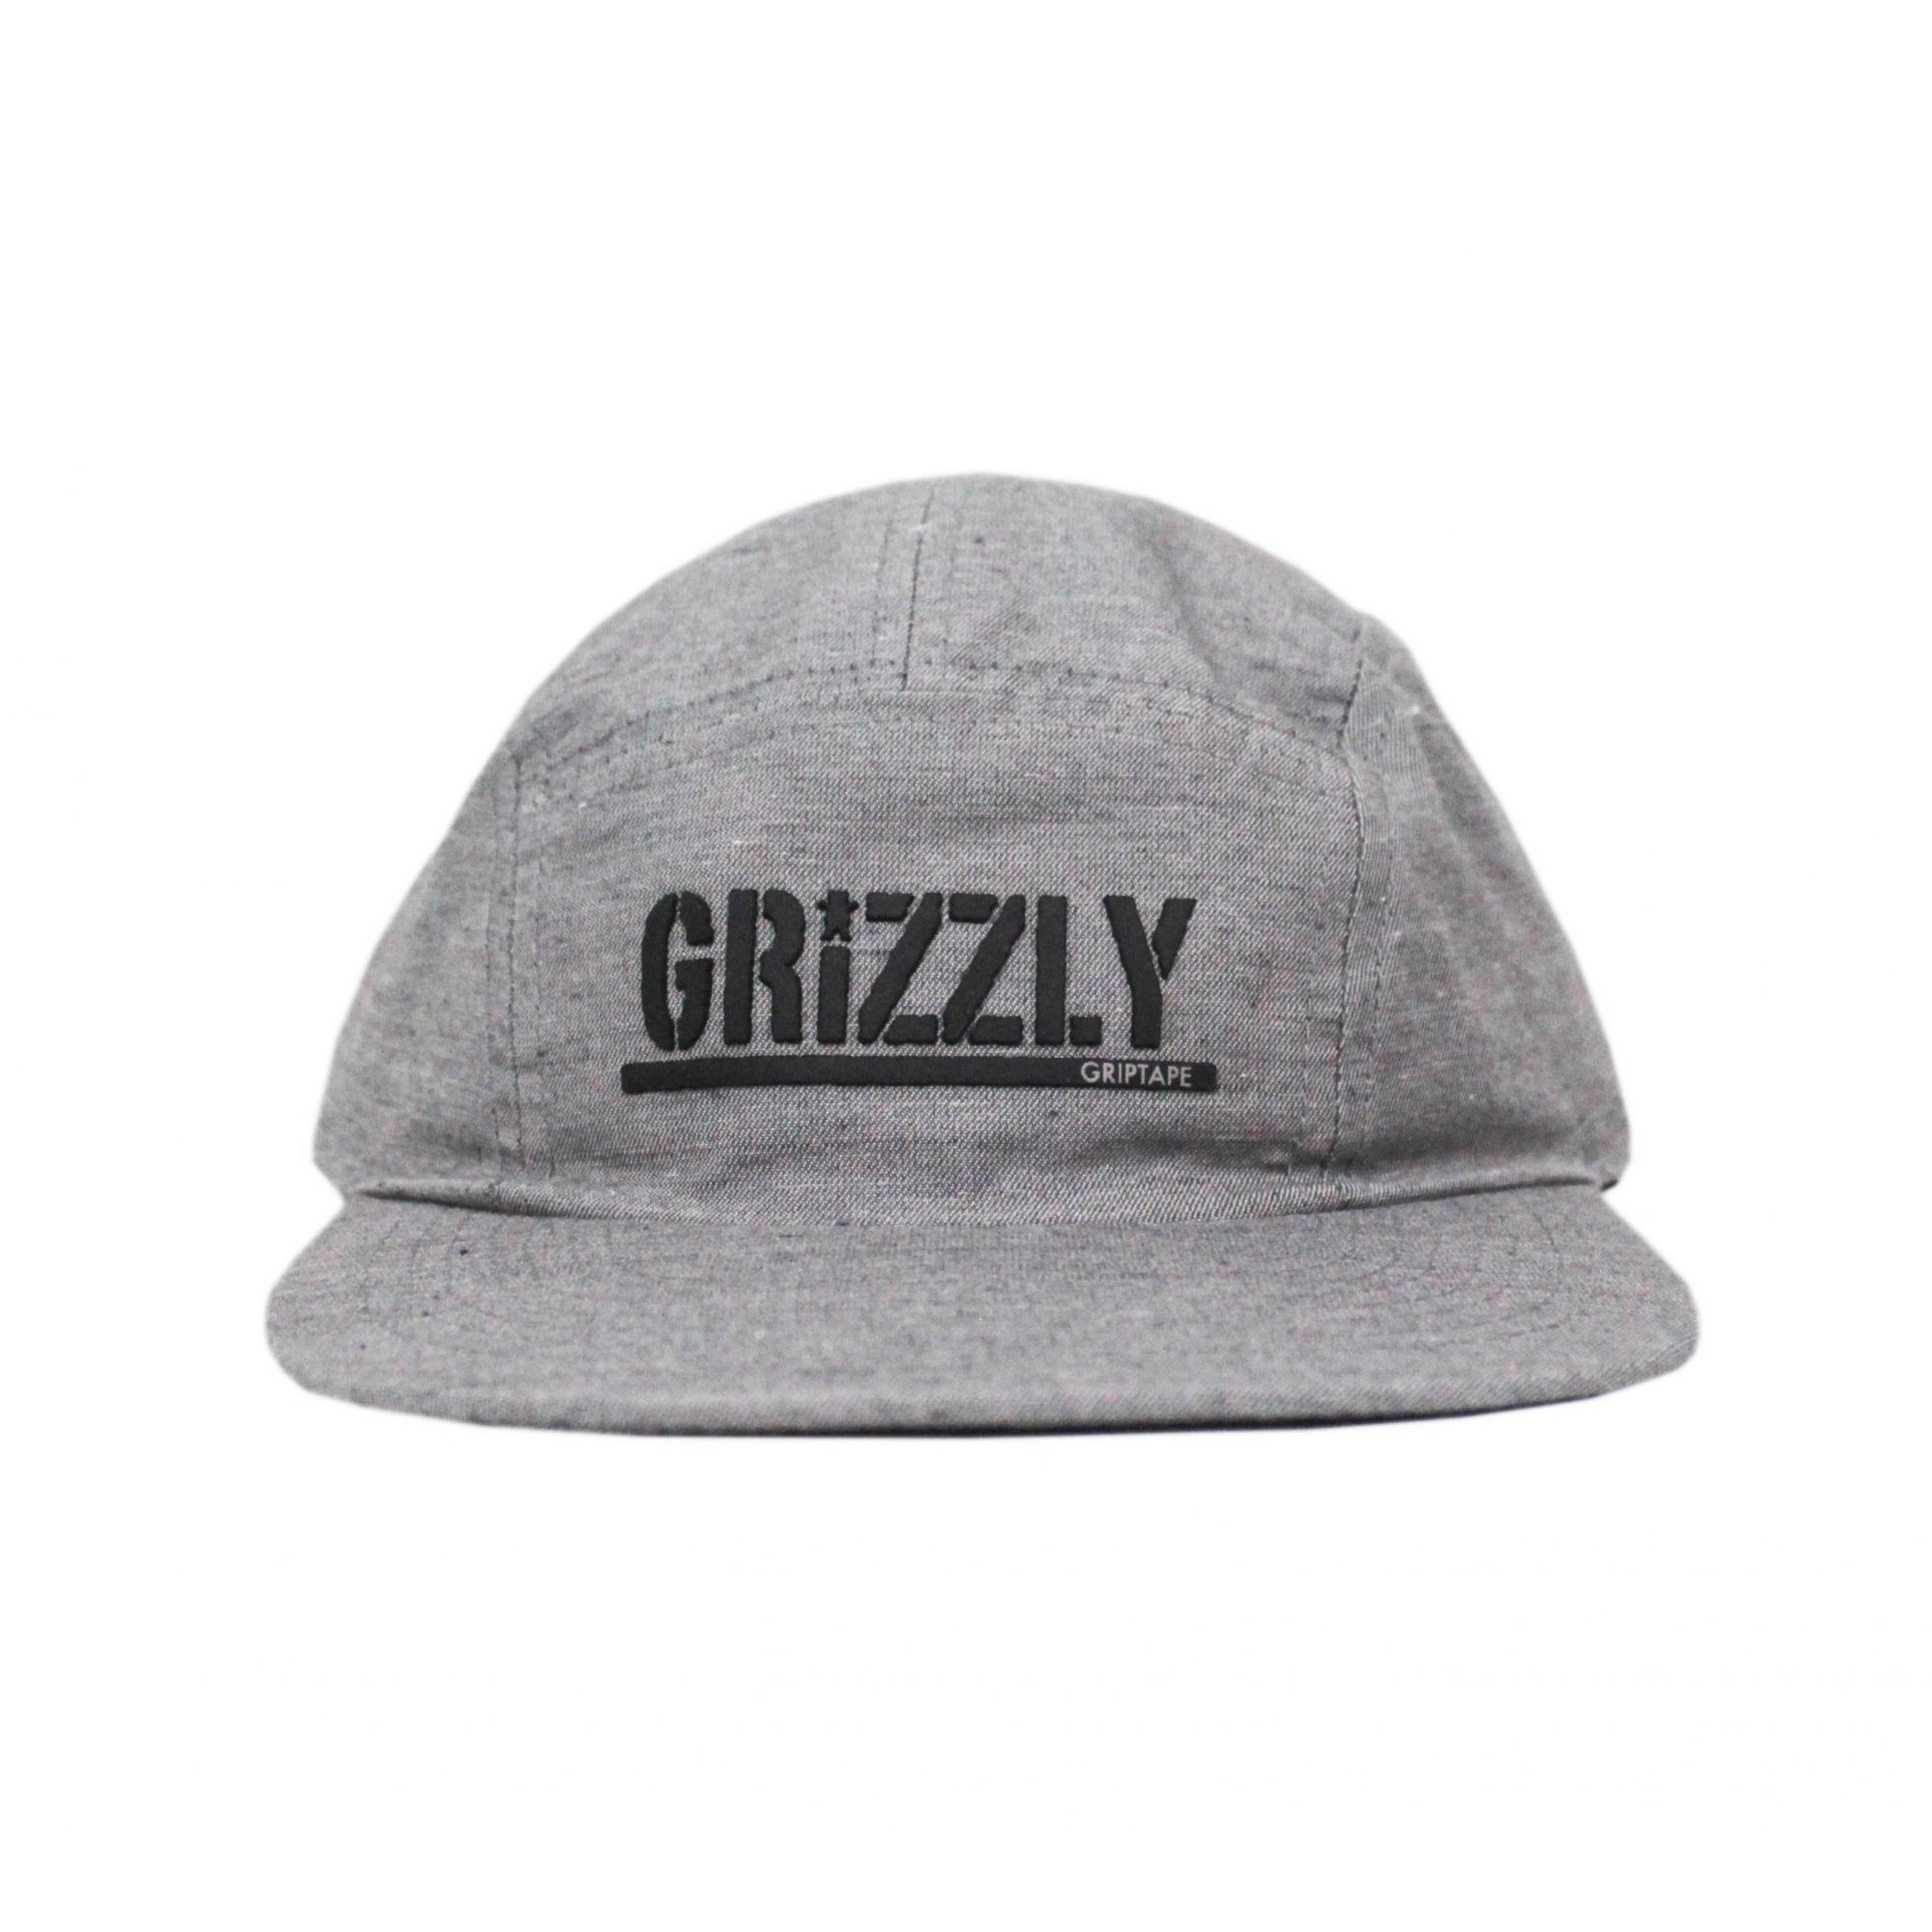 Boné Grizzly Five Panel Stamped Camper Unstructer Clip - Cinza